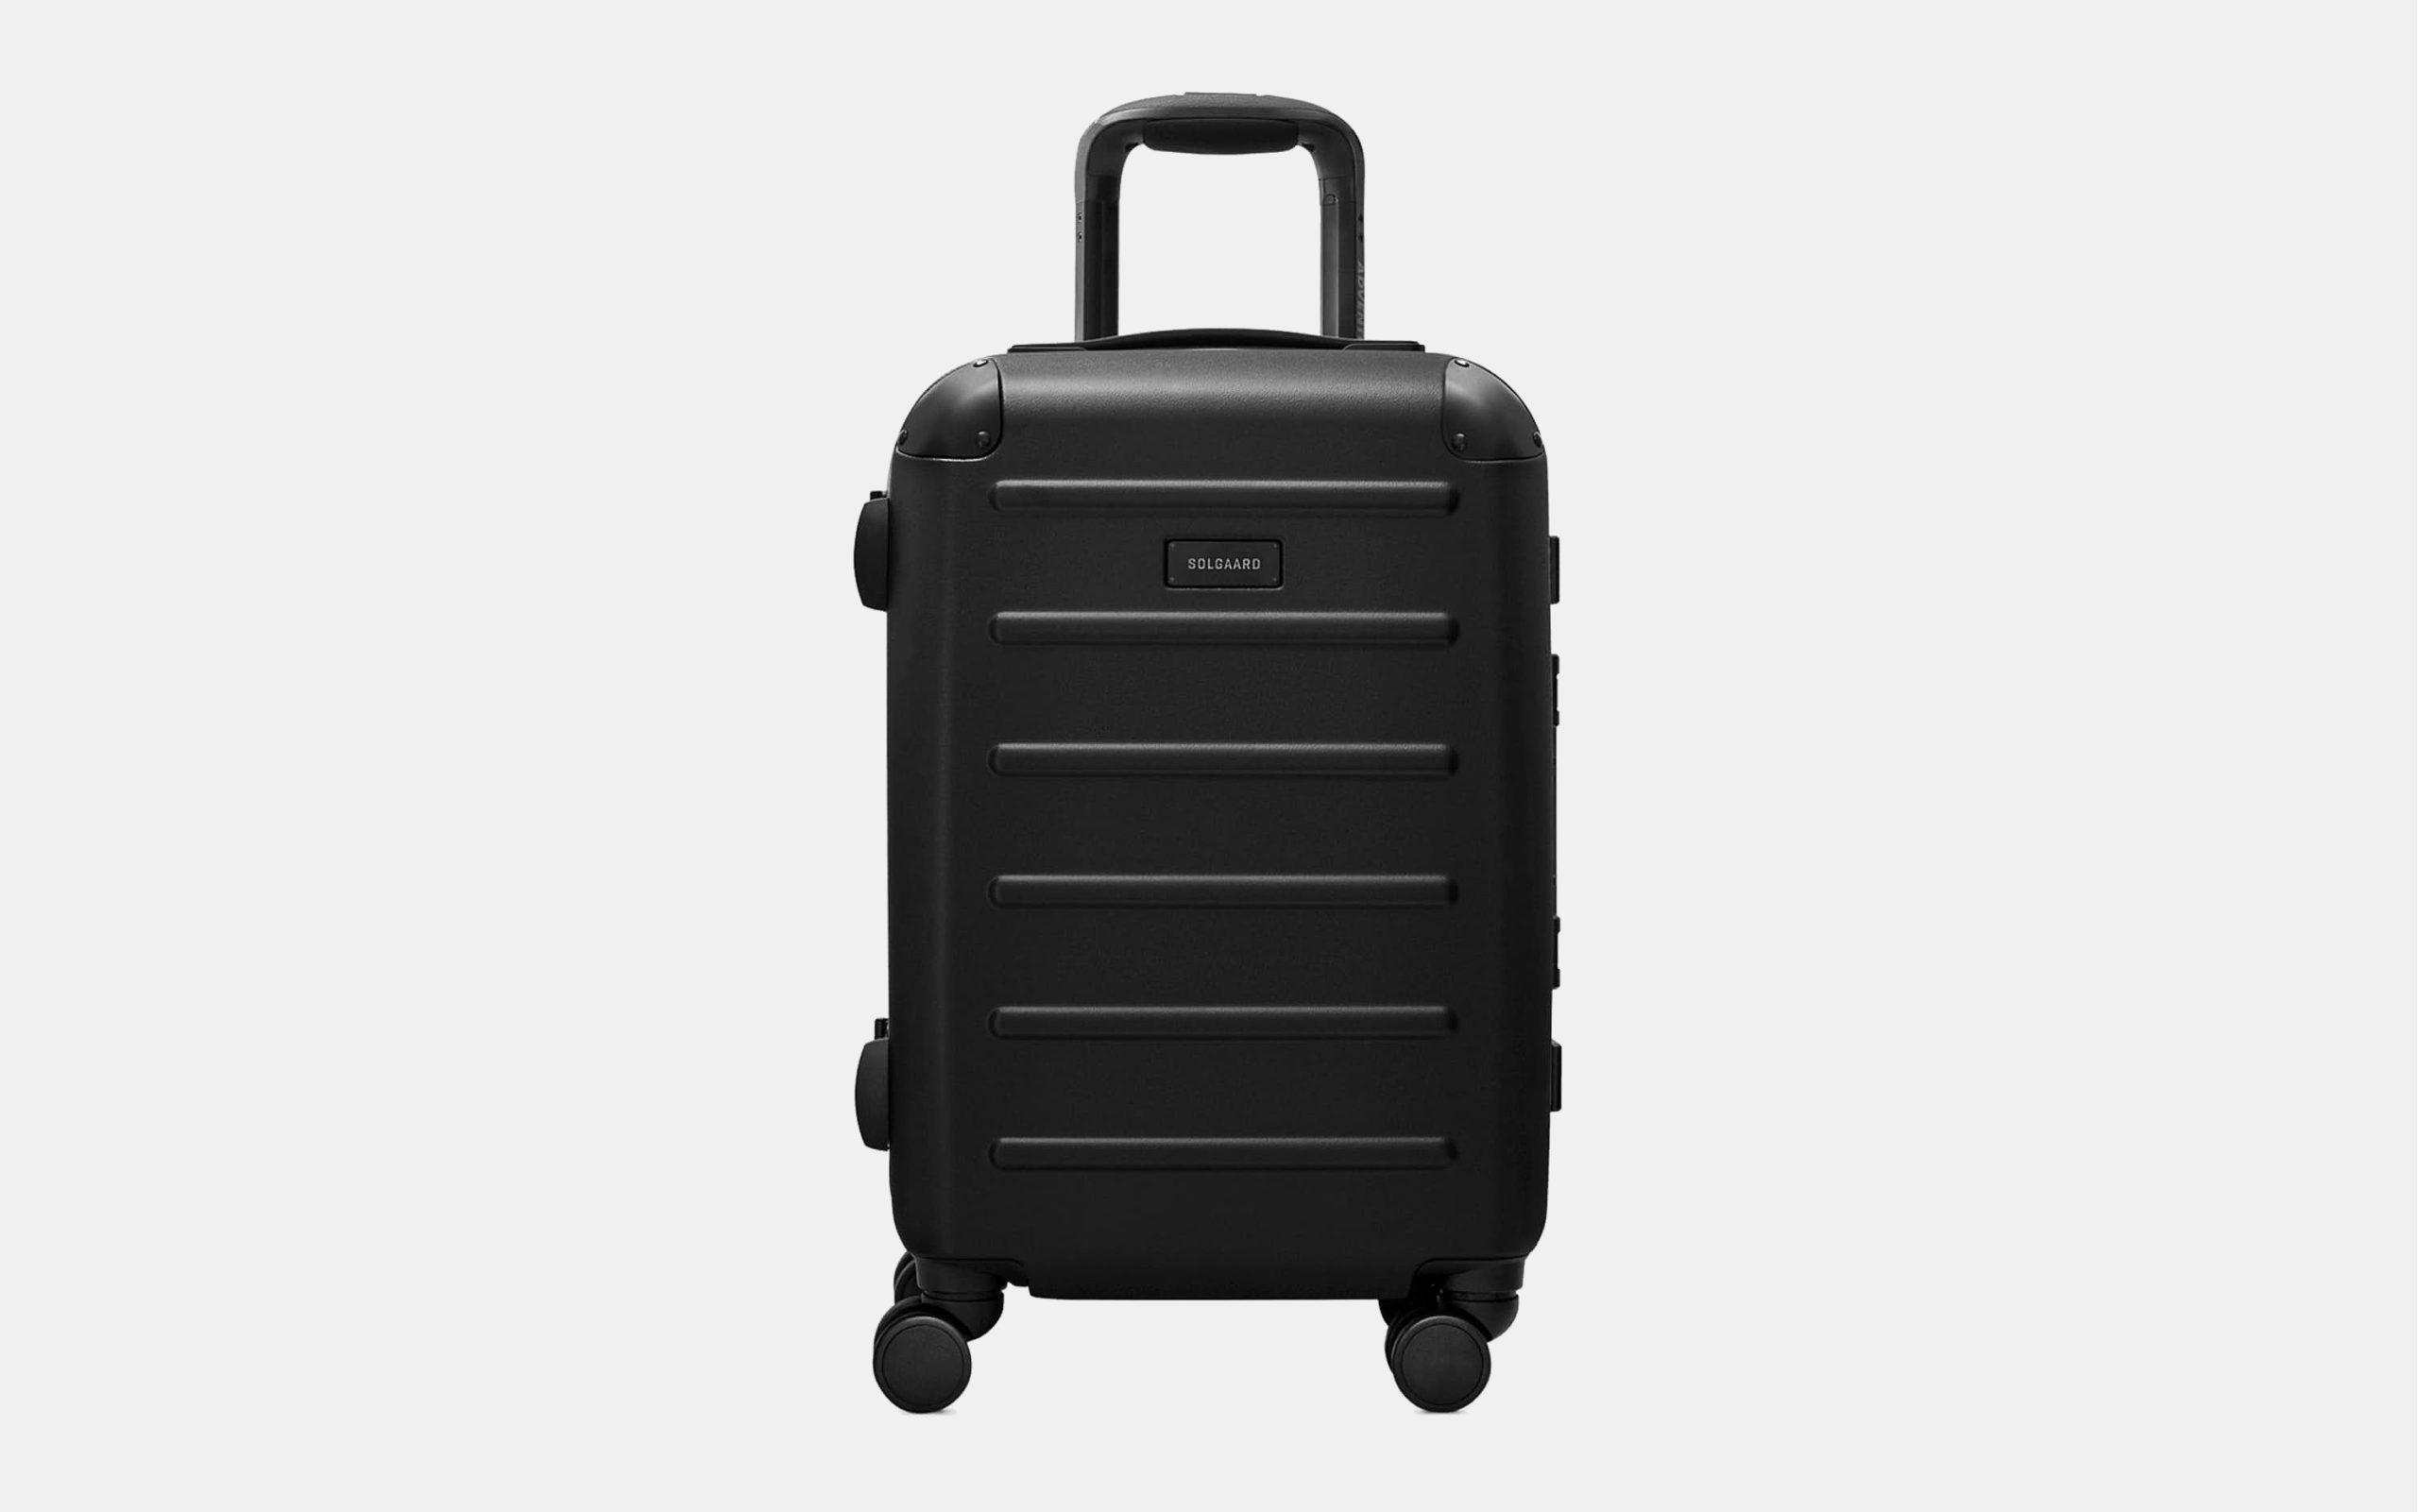 Solgaard Carry-On Closet 2.0